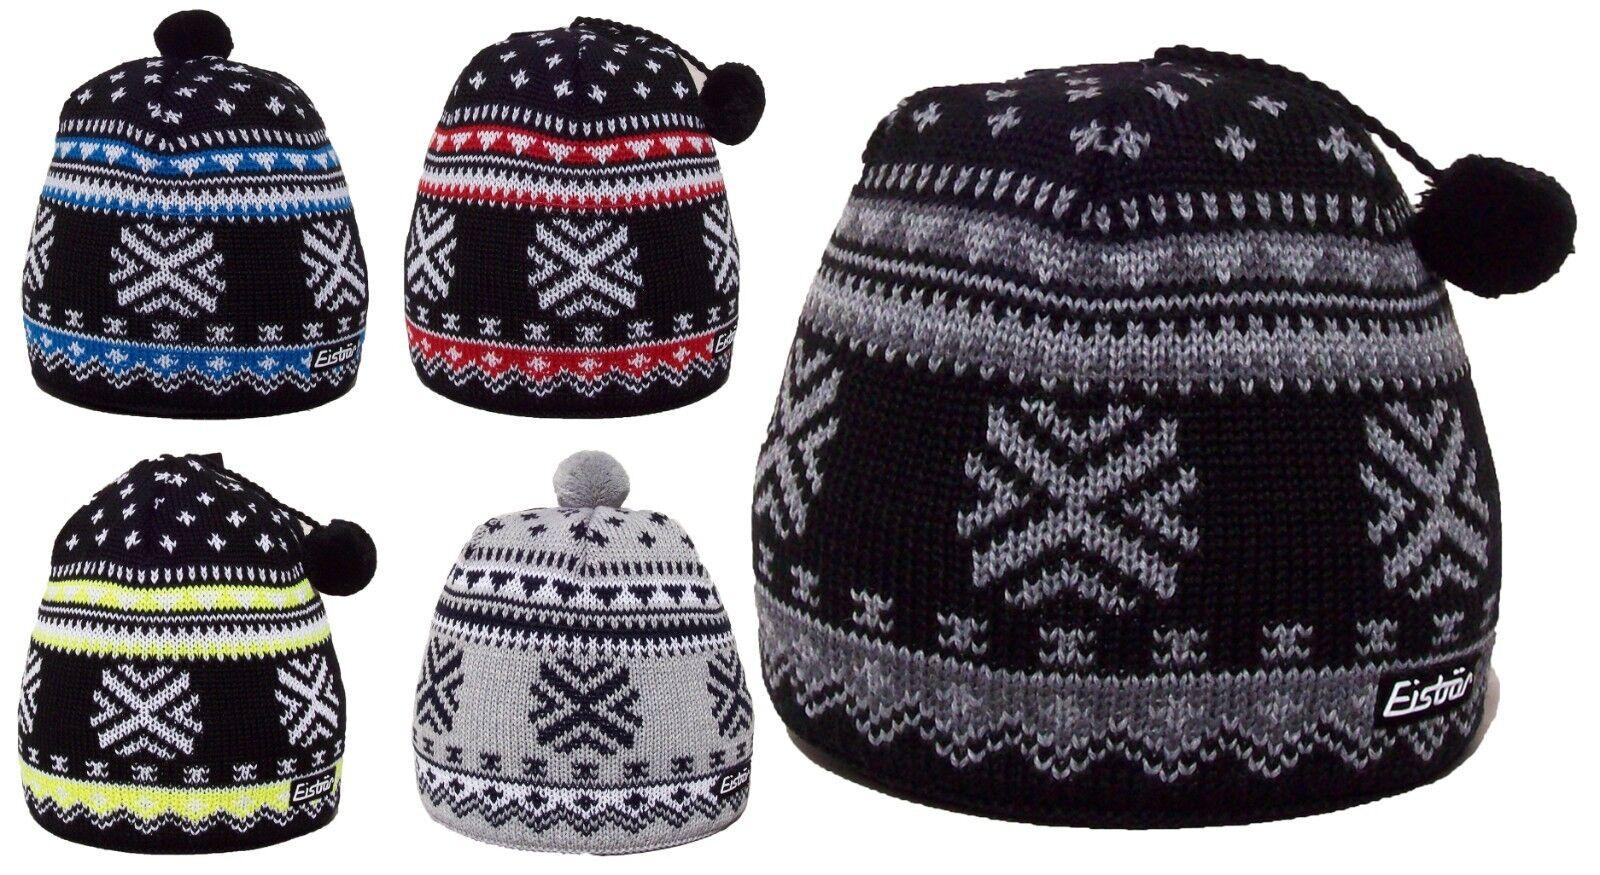 NEW- EISBAR HEINZ MU Austrian Merino Wool Knitted Winter Sport Ski Bobble Hat